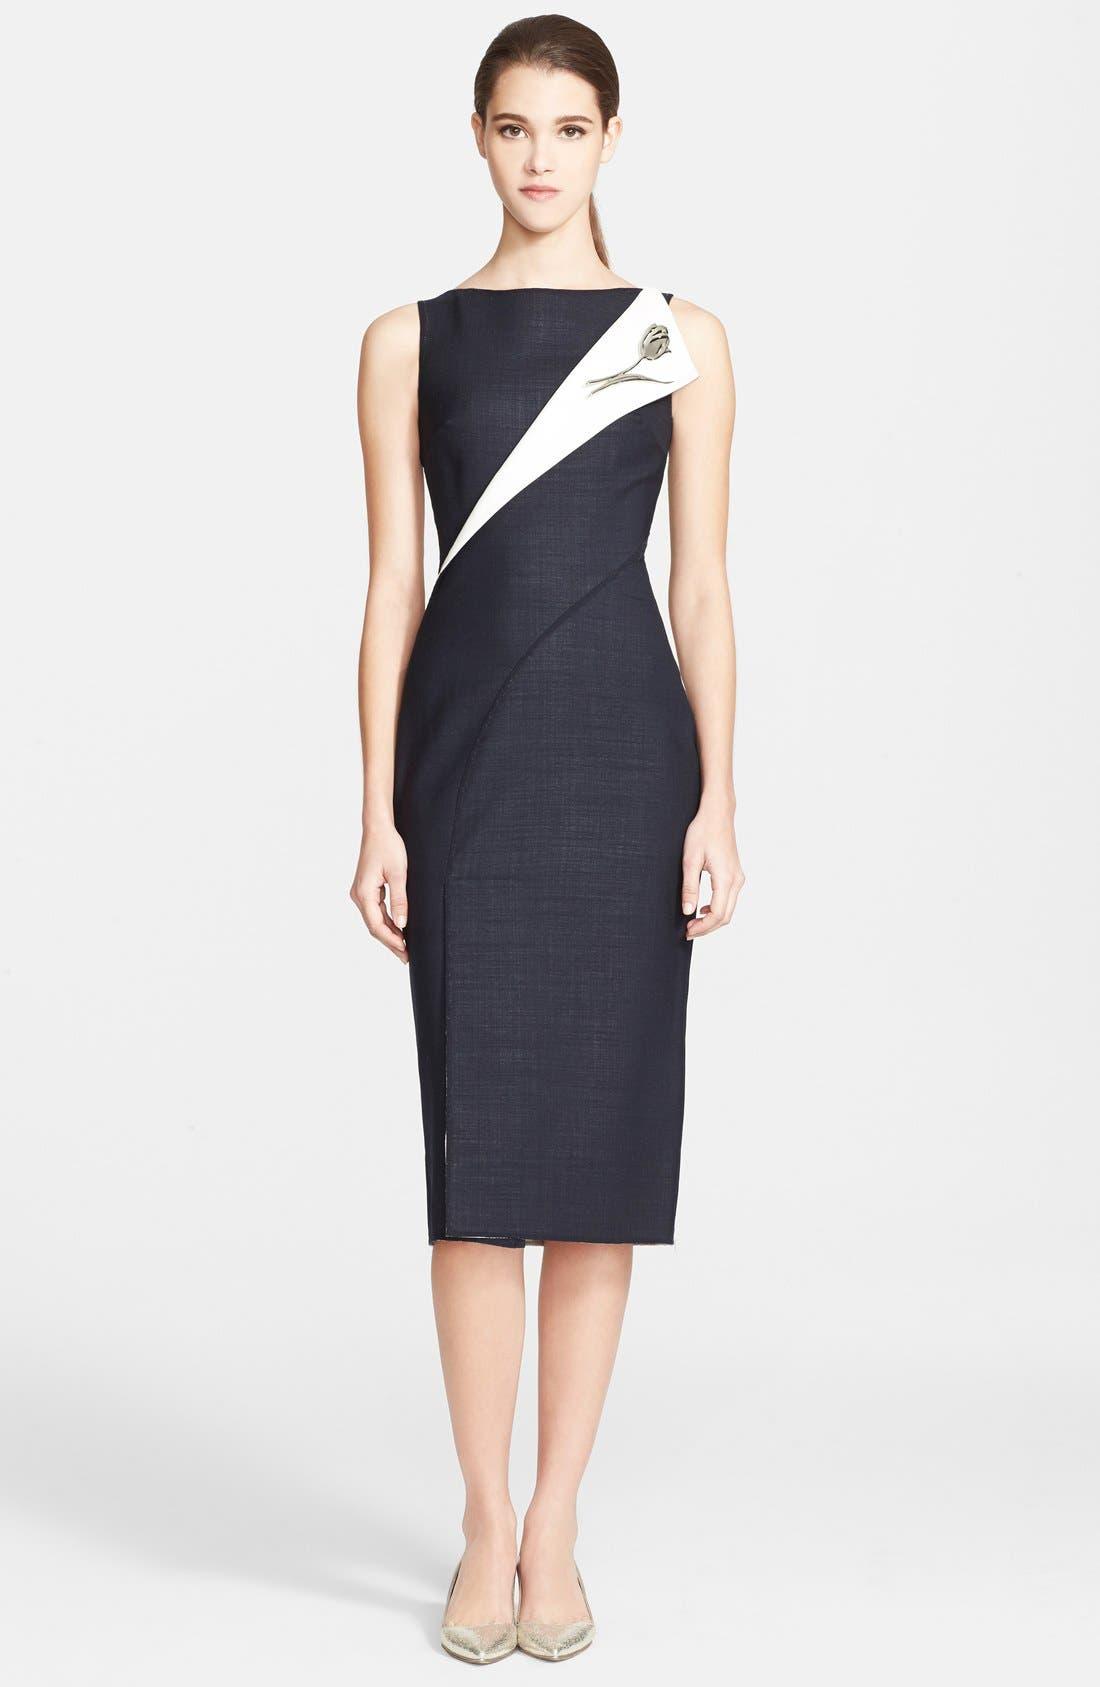 Main Image - Oscar de la Renta Folded Double-Face Wool Blend Pencil Dress